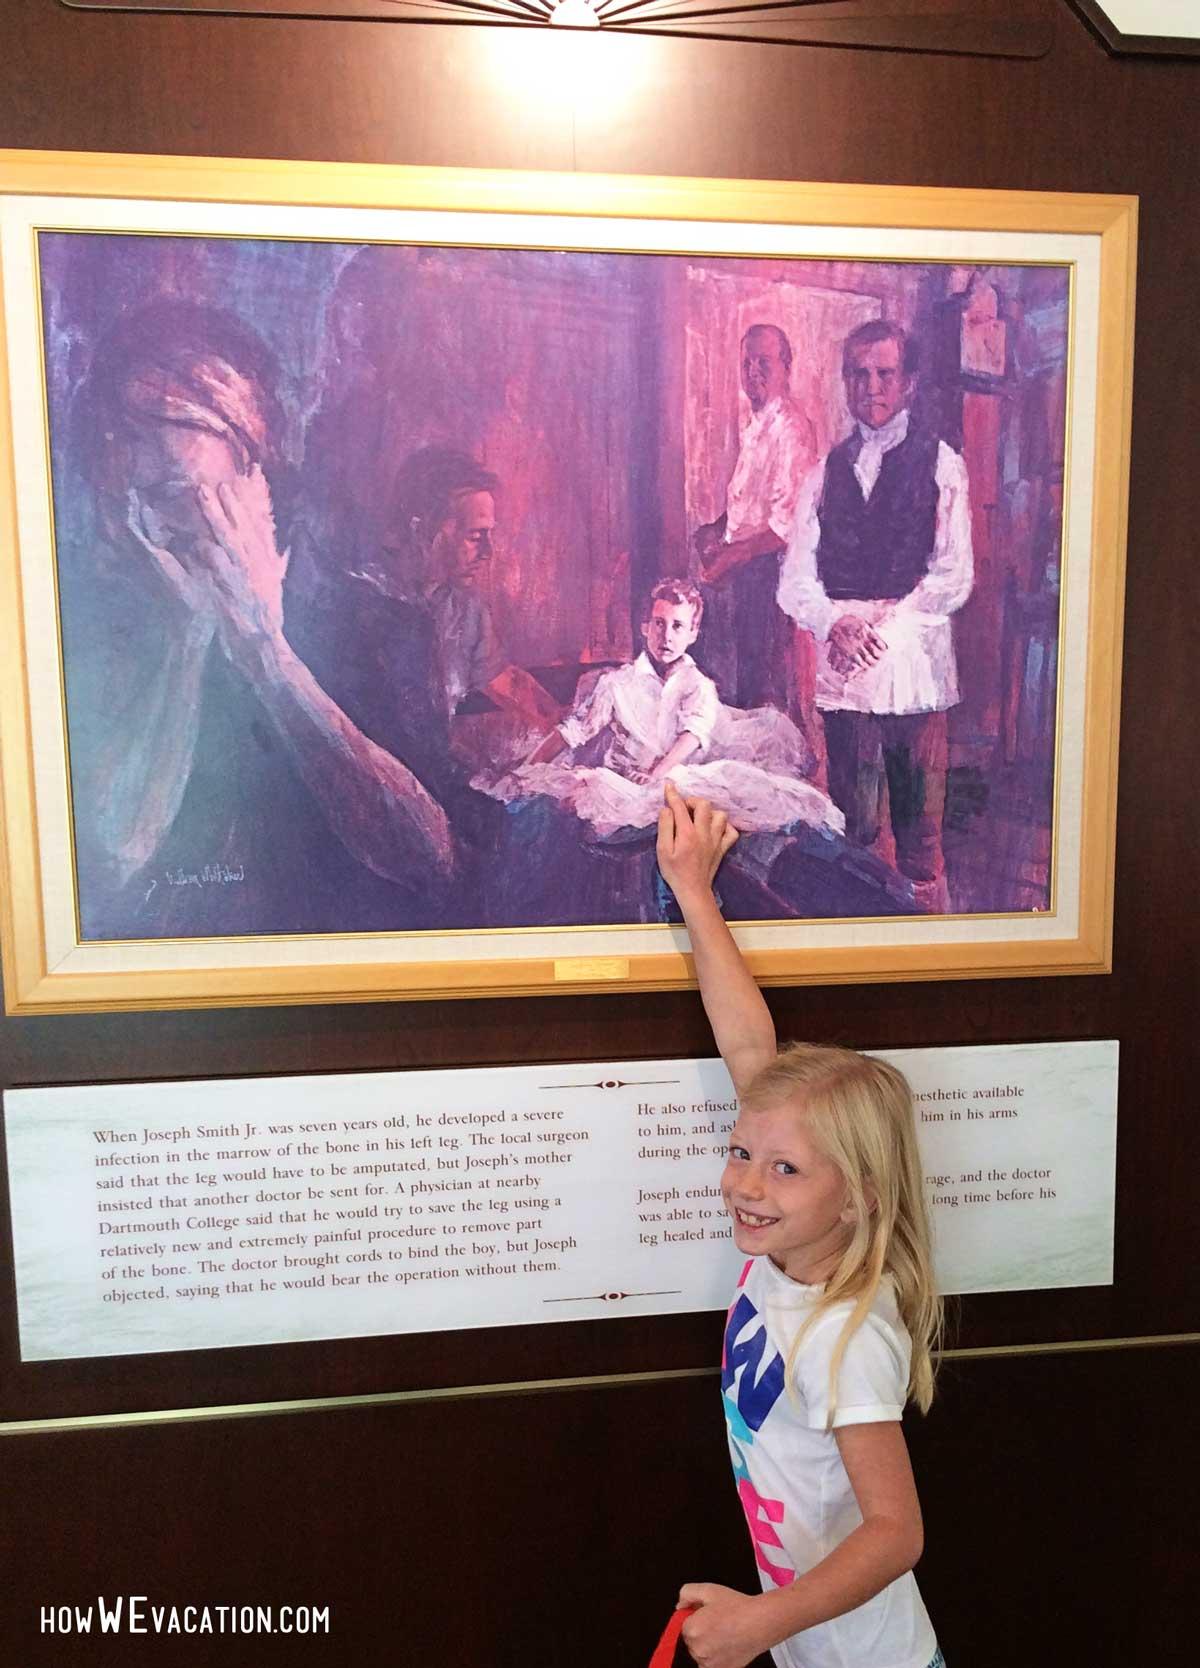 Joseph Smith Memorial visitor's center